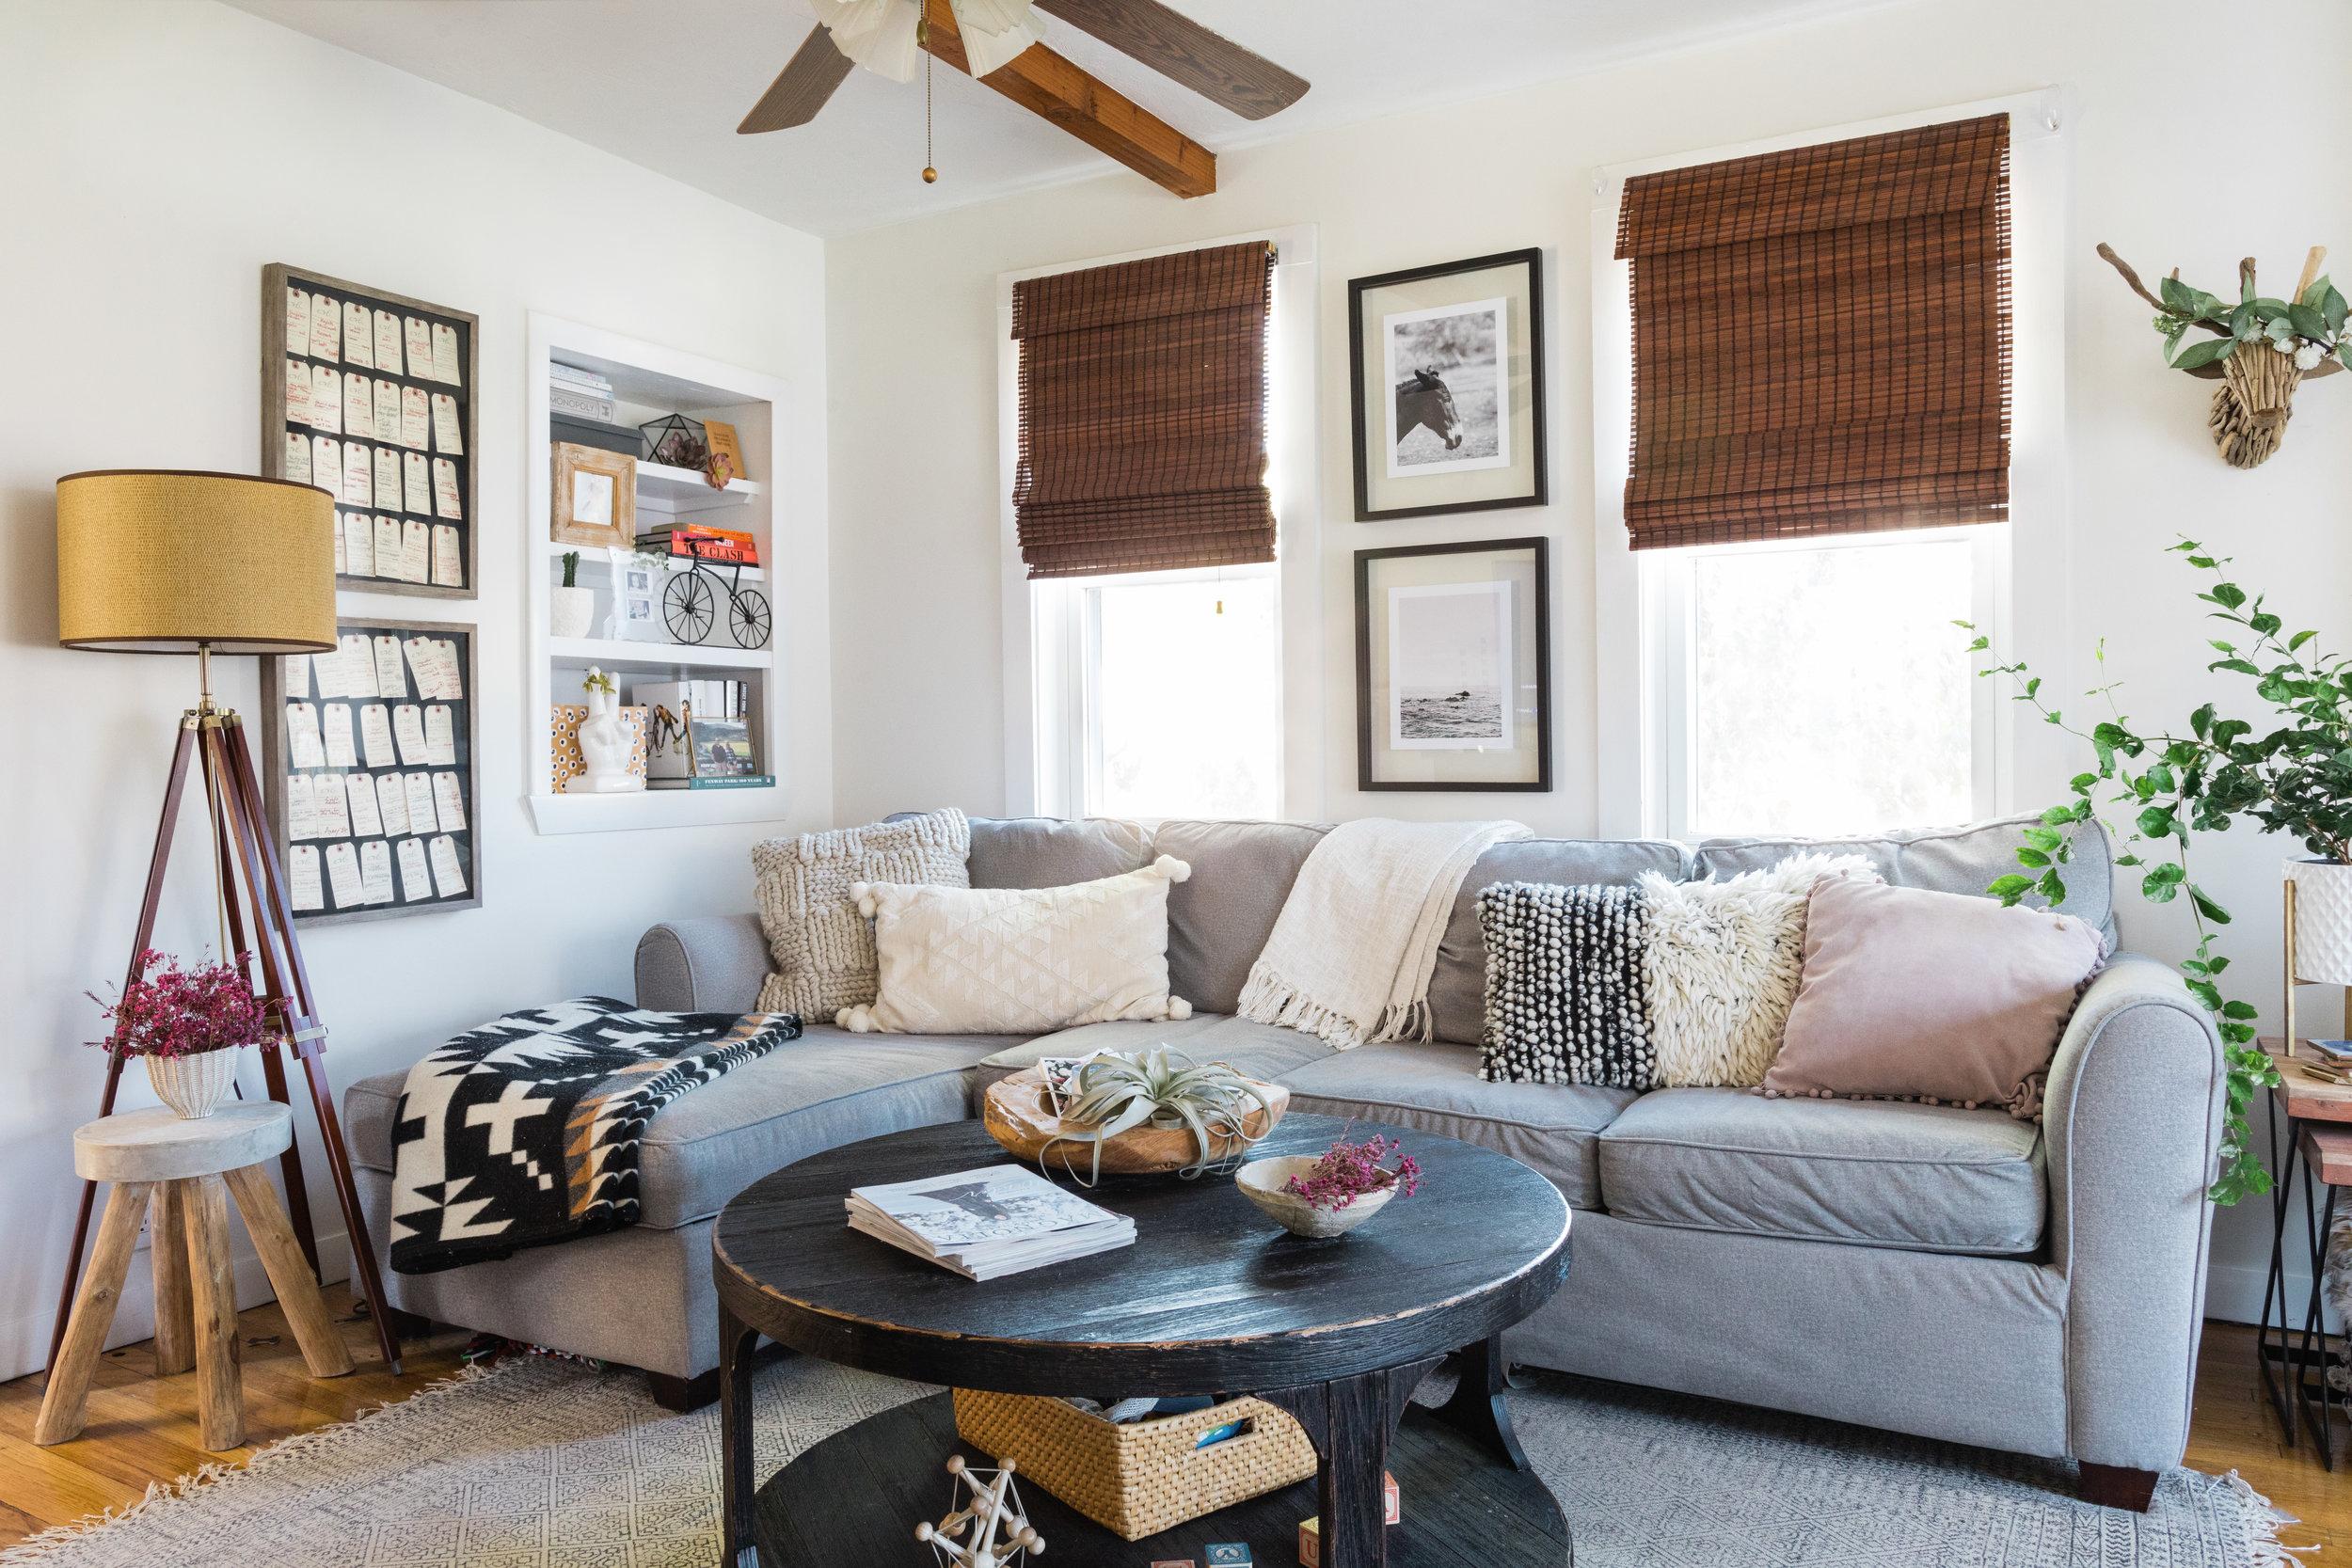 coffee table  /  tripod lamp  / pendleton blanket { similar } / couch { similar } /  rug  / driftwood stag { similar } / driftwood garland { similar } / knit pillow { similar } /  linen throw  / stool { similar }